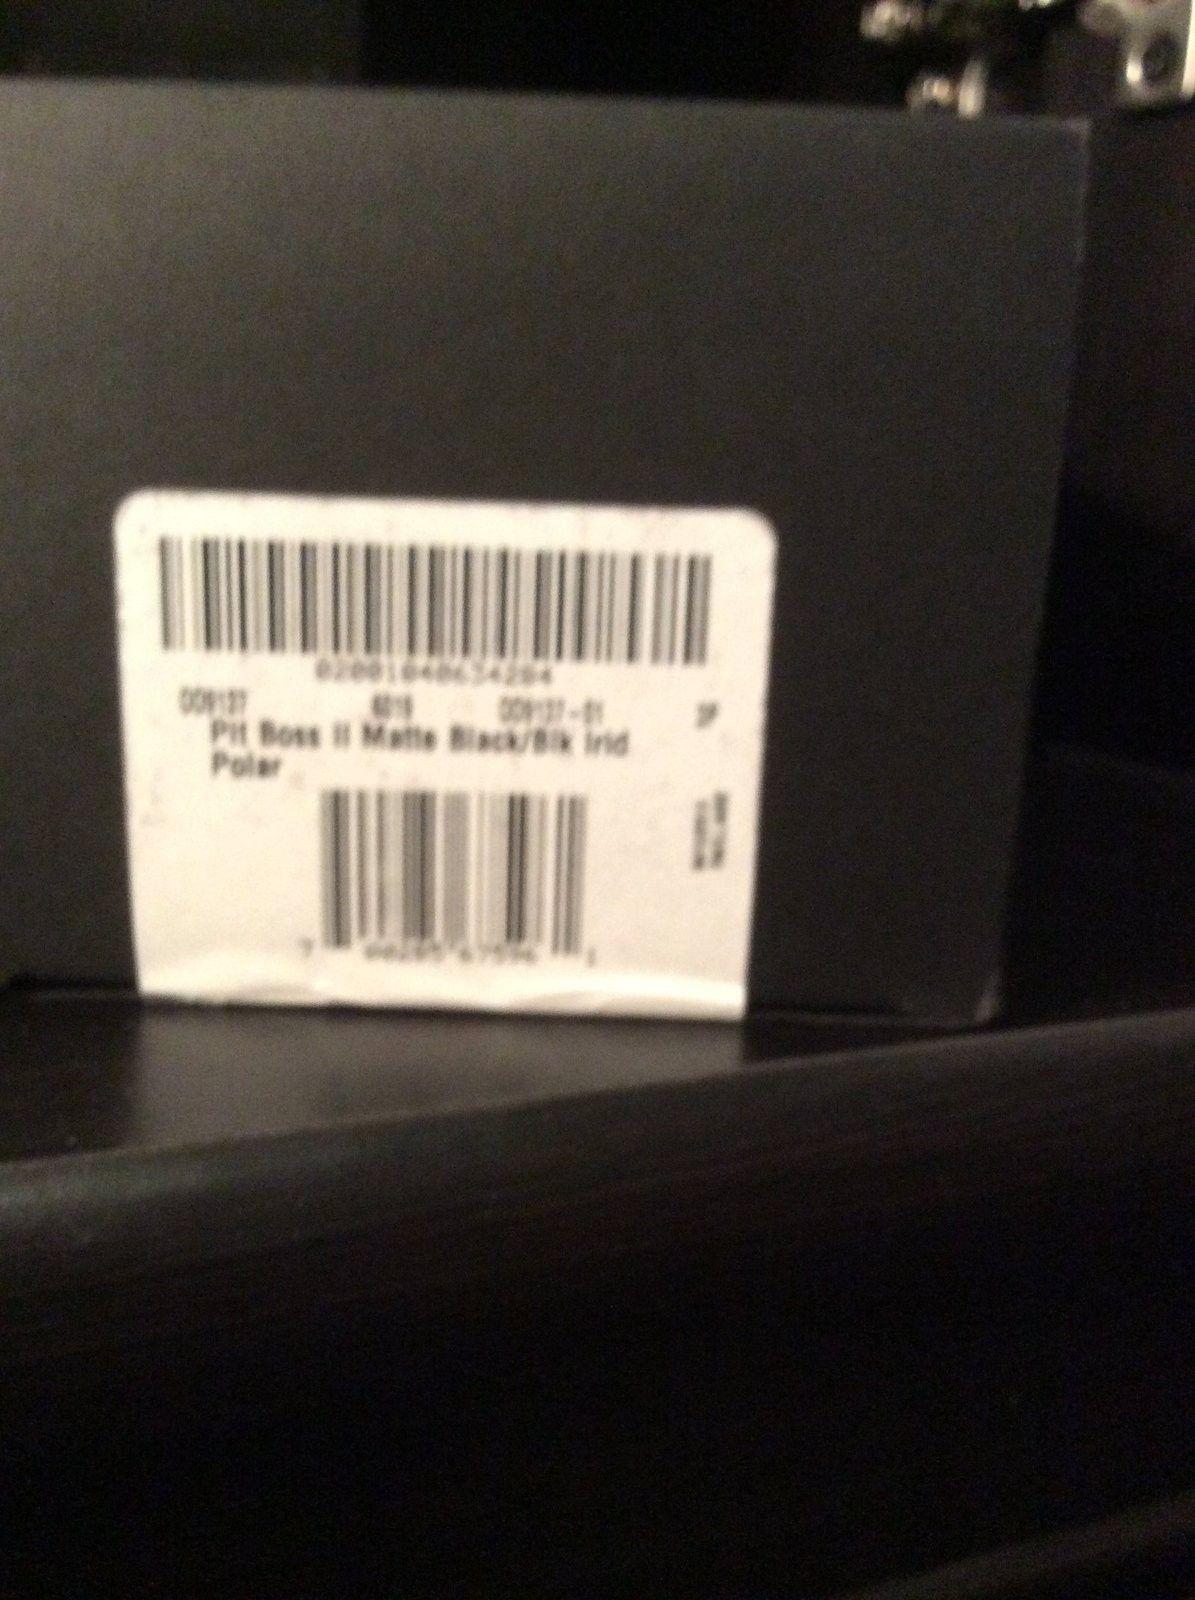 $ 265 G/S Pit boss 2 bnib matte black black Irridium - image.jpeg